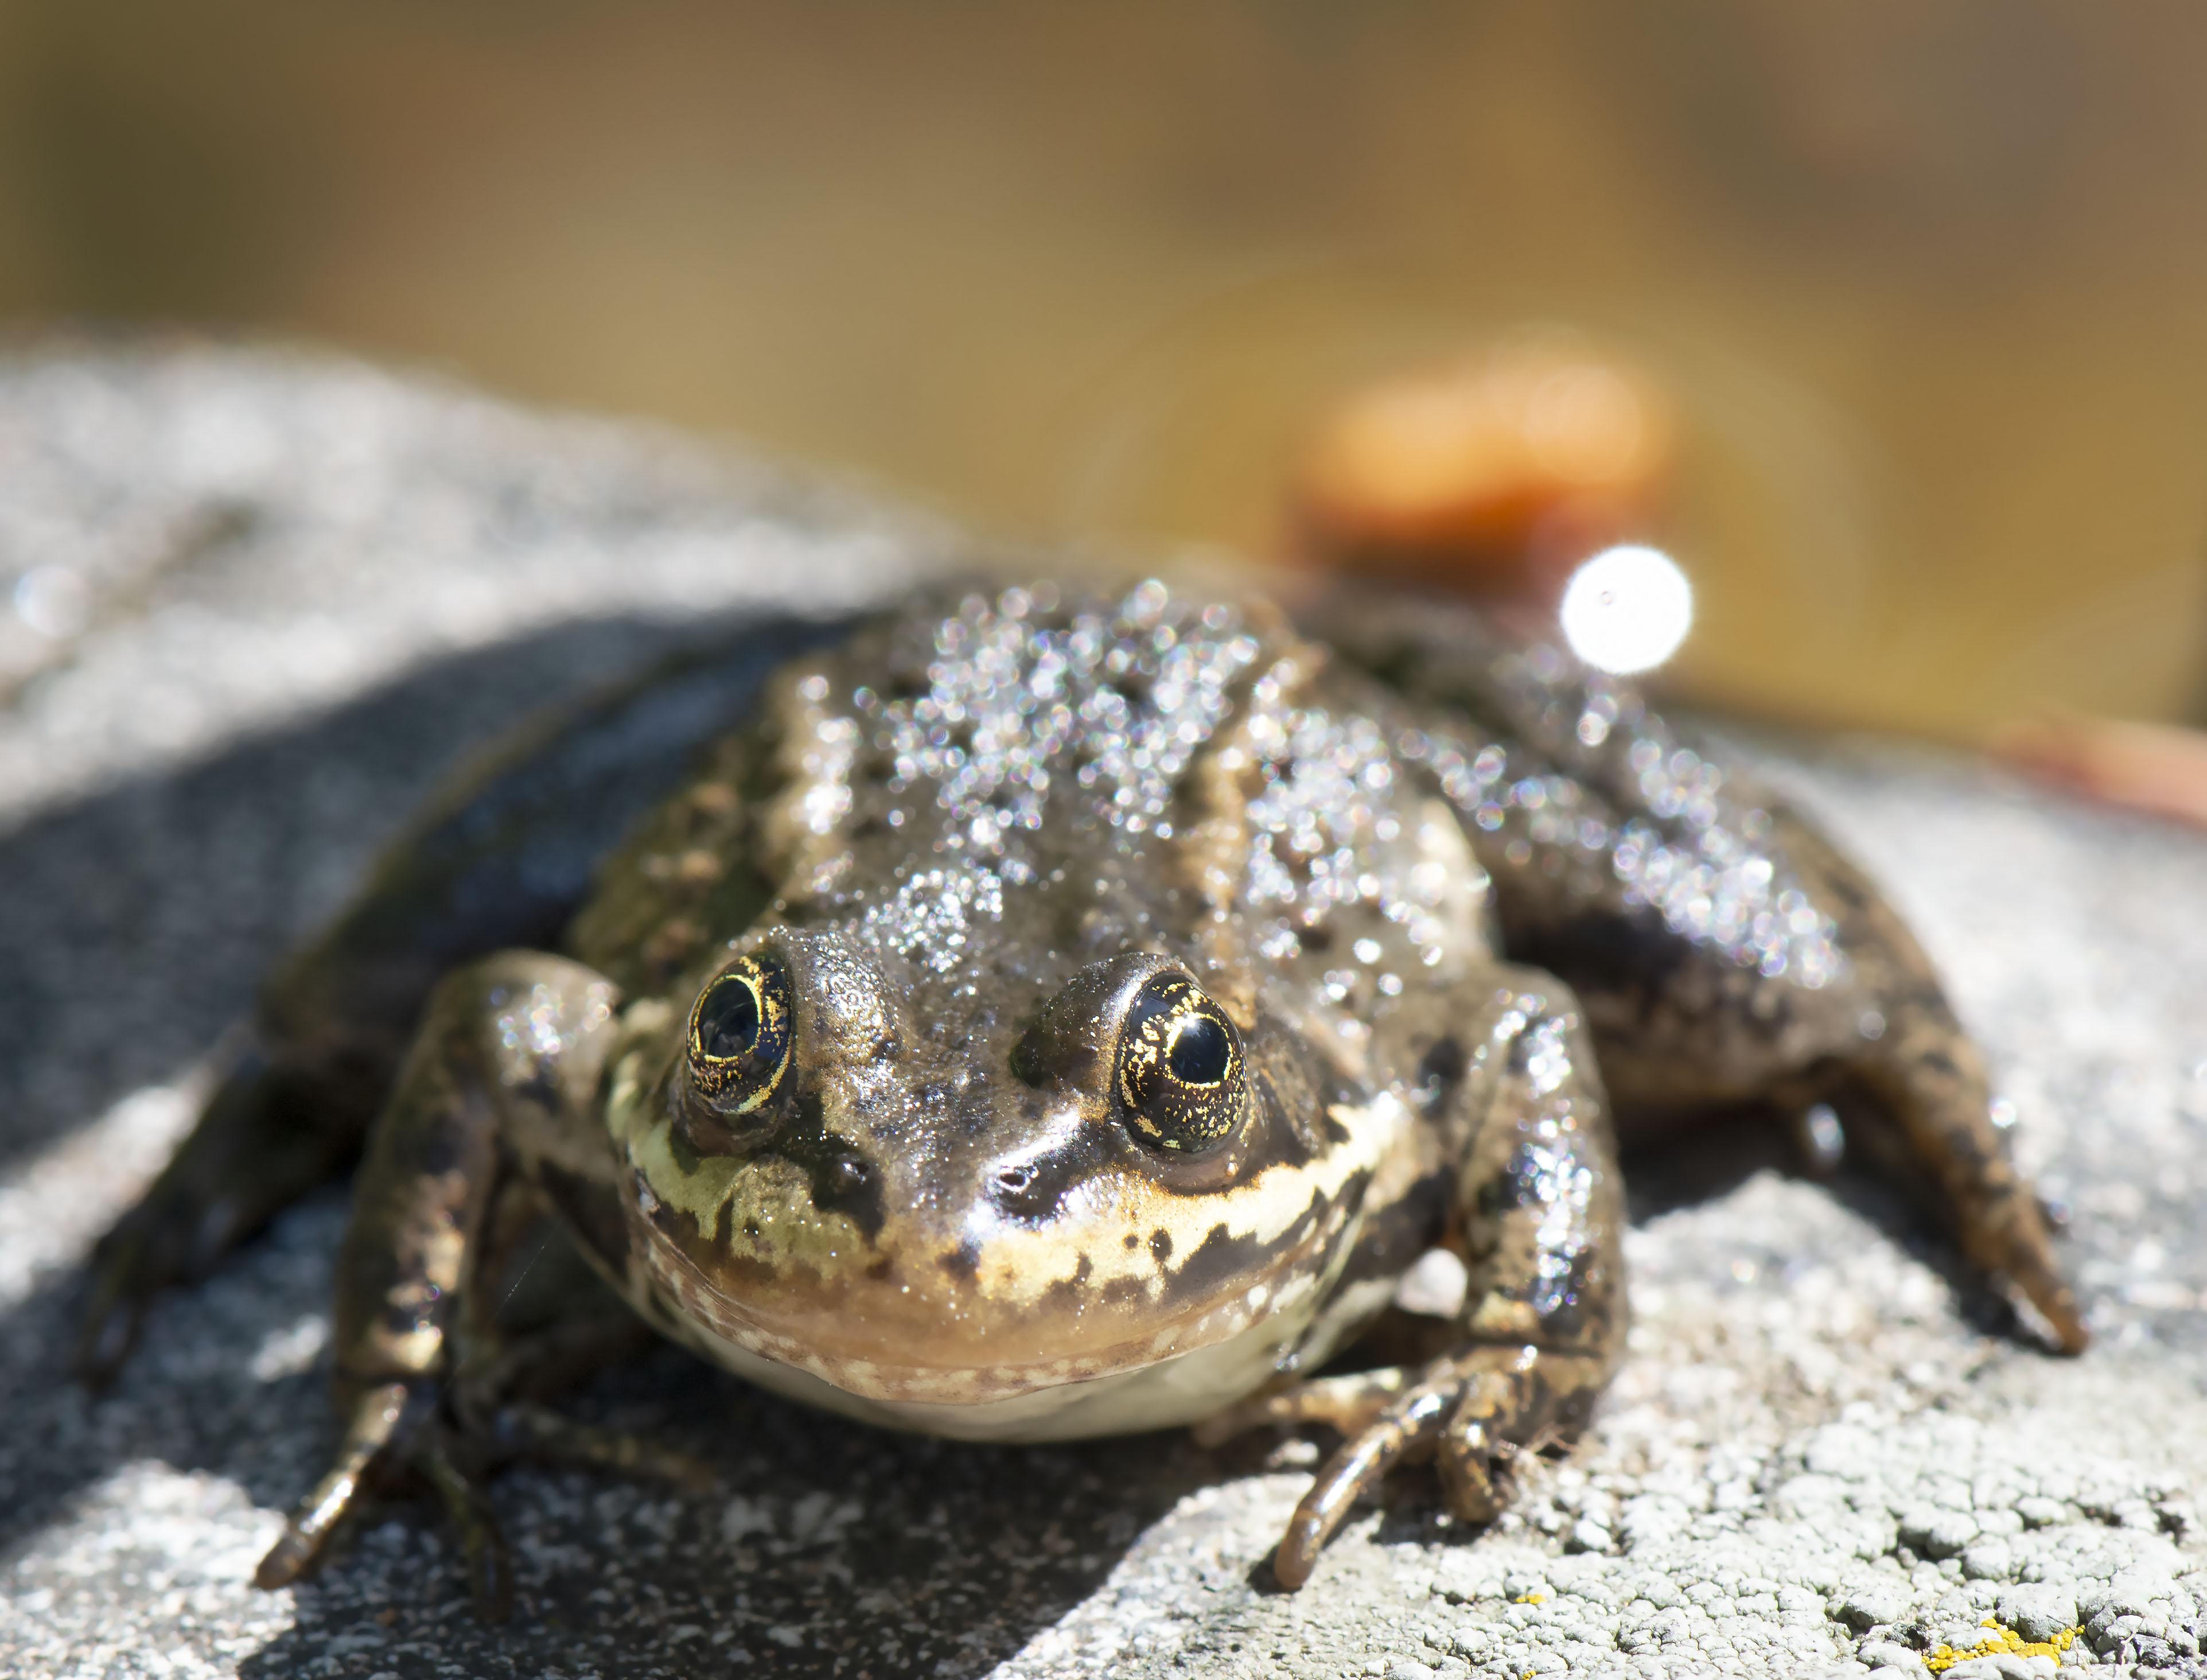 Frog_eyes_1435